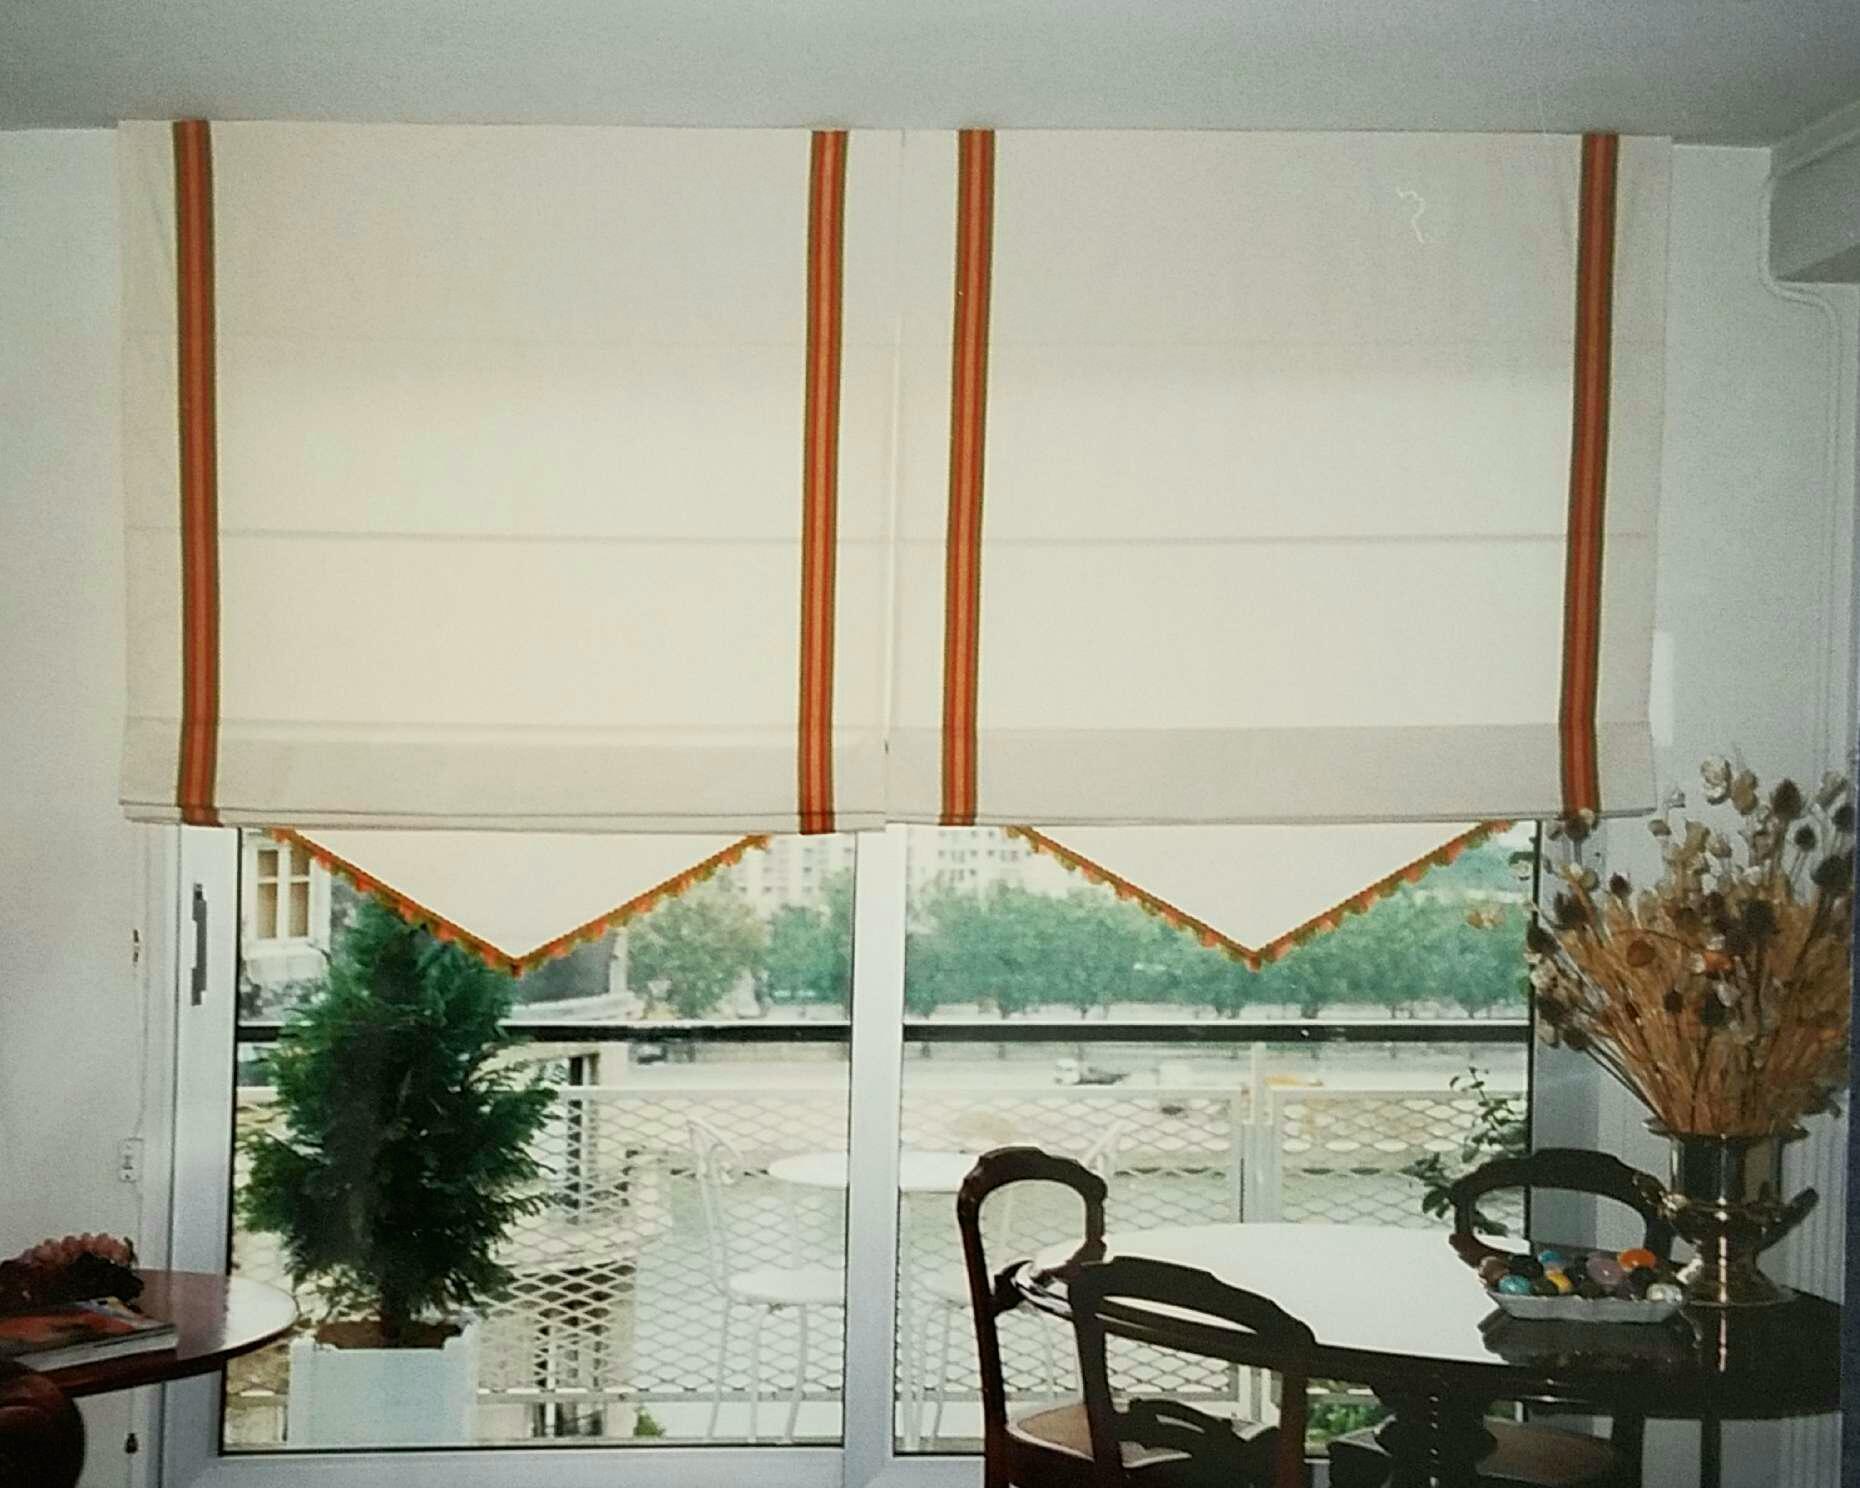 window treatments san diego window blinds san diego upholstery restoration custom window treatement treatments